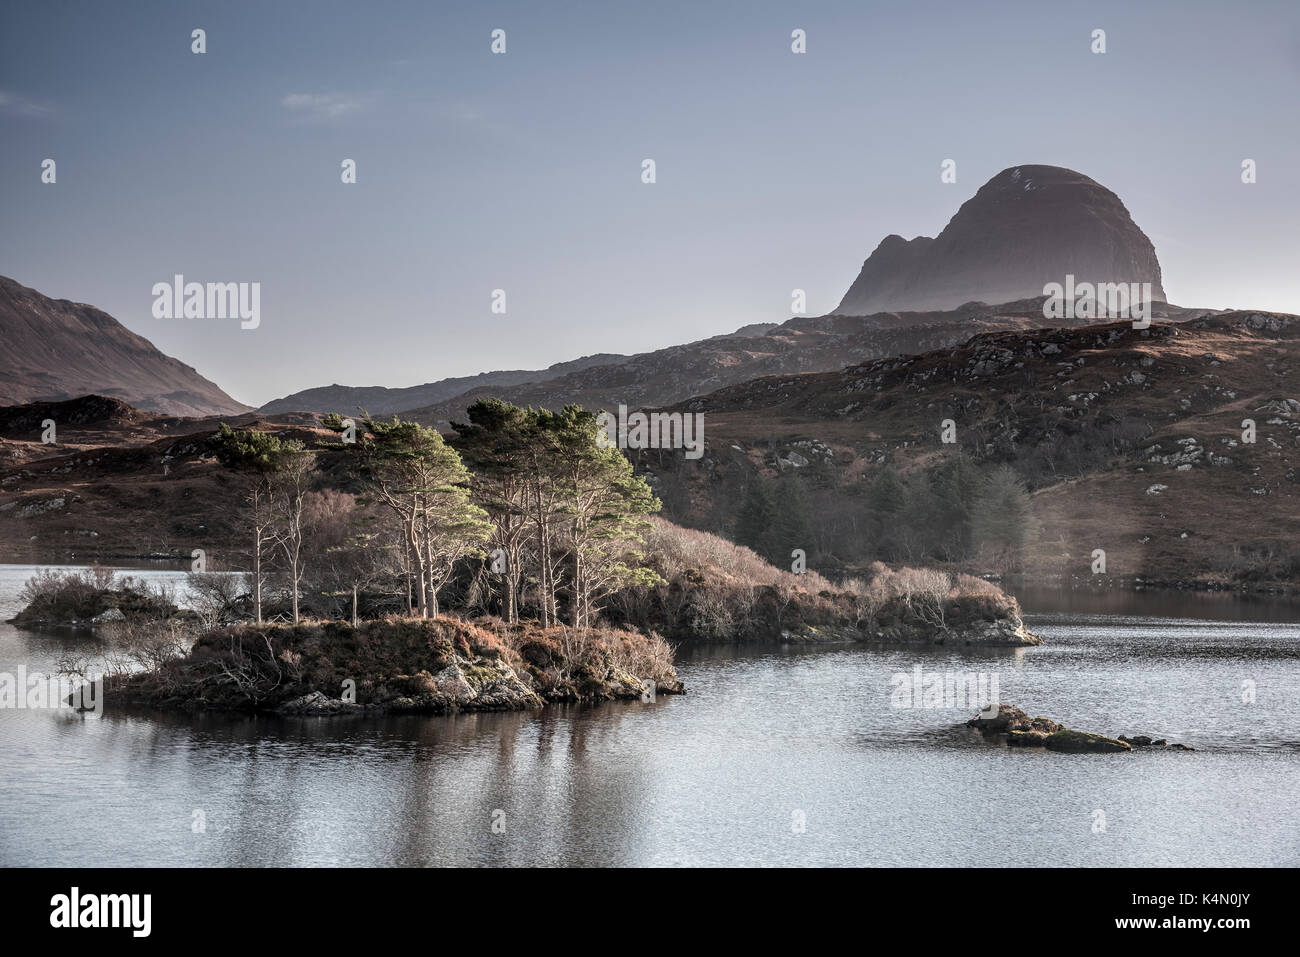 Loch Druim Suardalain, Mount Suilven, Lochinver, Sutherland, Highlands, Scotland, United Kingdom, Europe Stock Photo